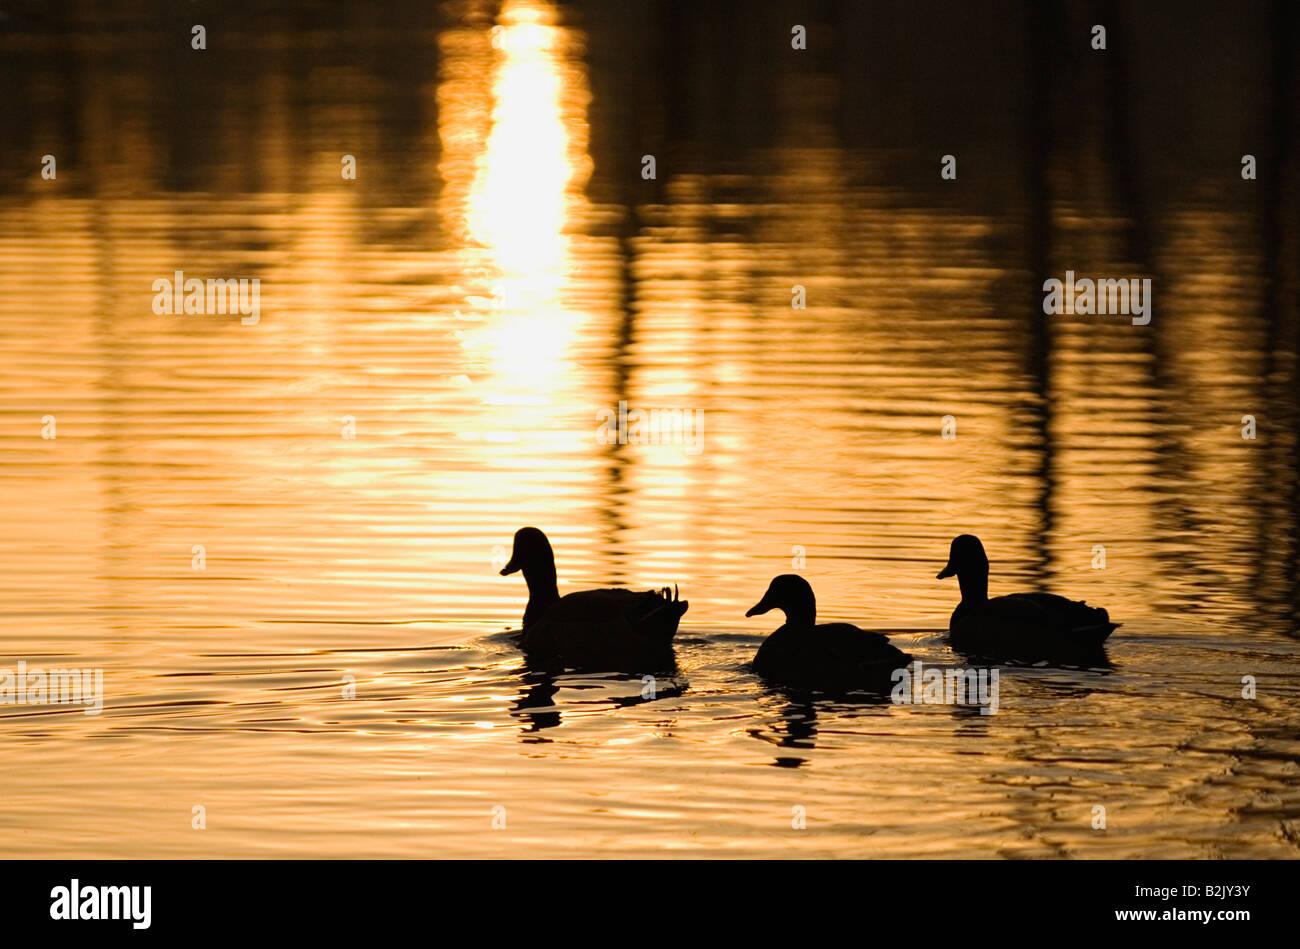 Silhouette of Three Mallard Ducks Swiiming on Pond at Sunrise Webster County Kentucky - Stock Image